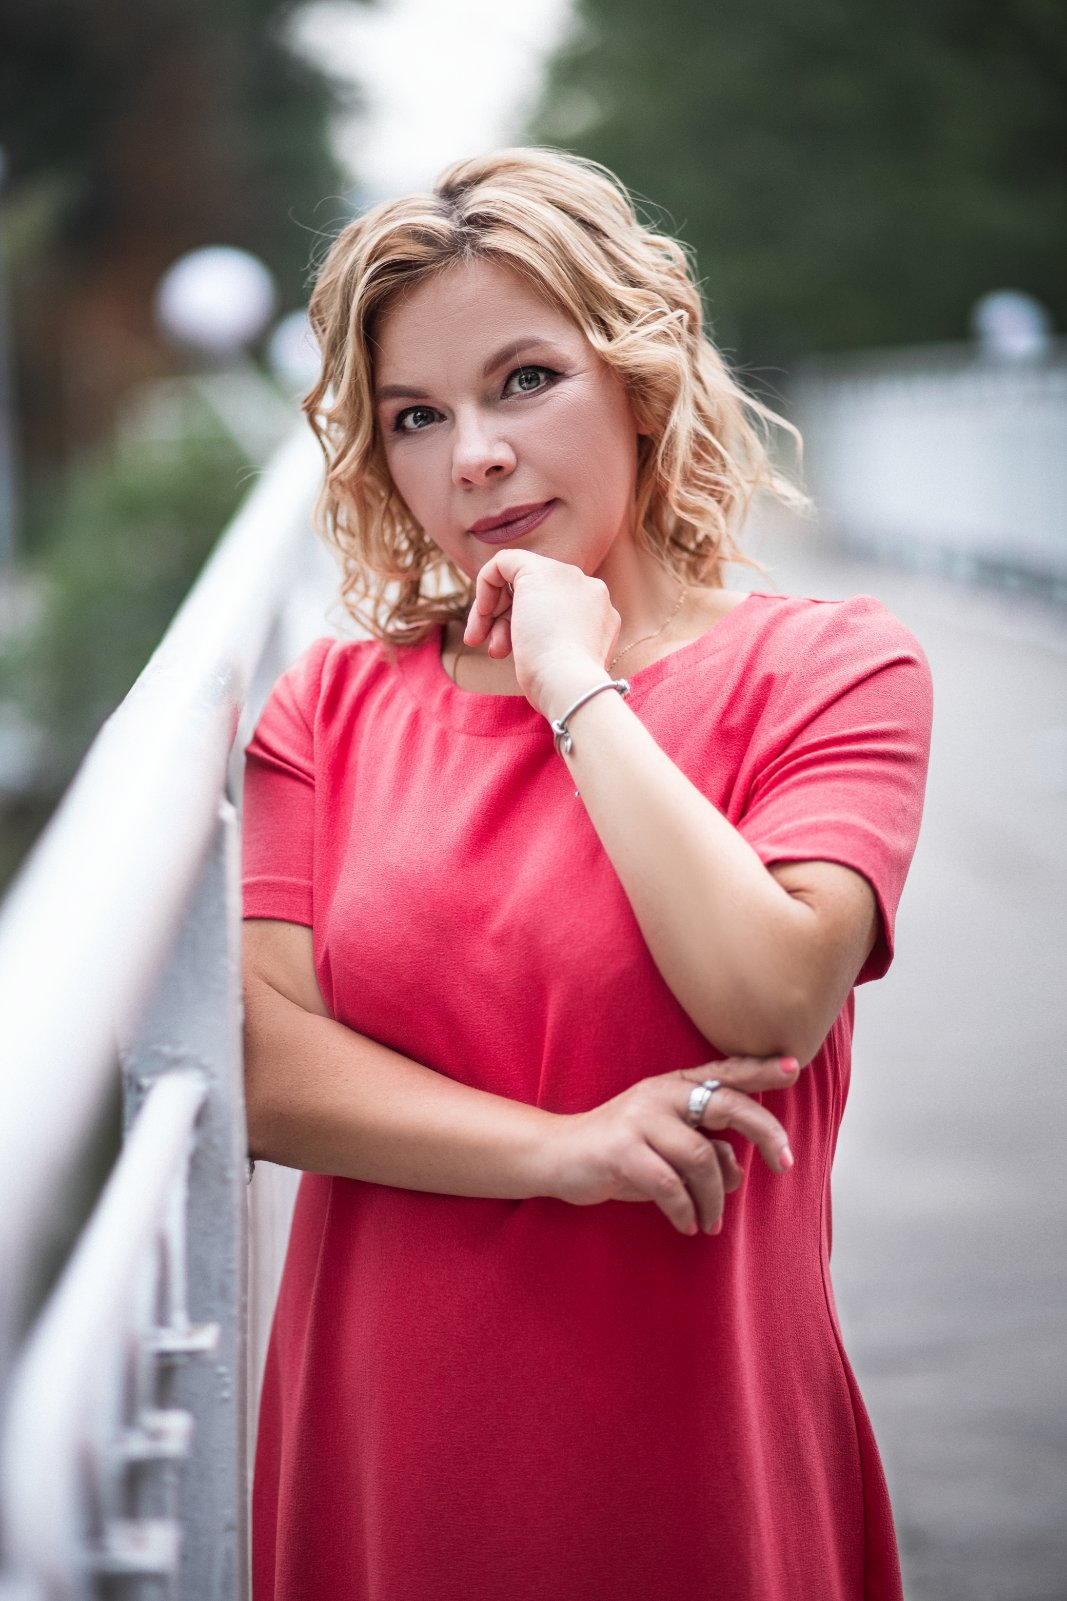 Anna, Im 43, from ucraina-zaporizzja - Marriage Agency Futura